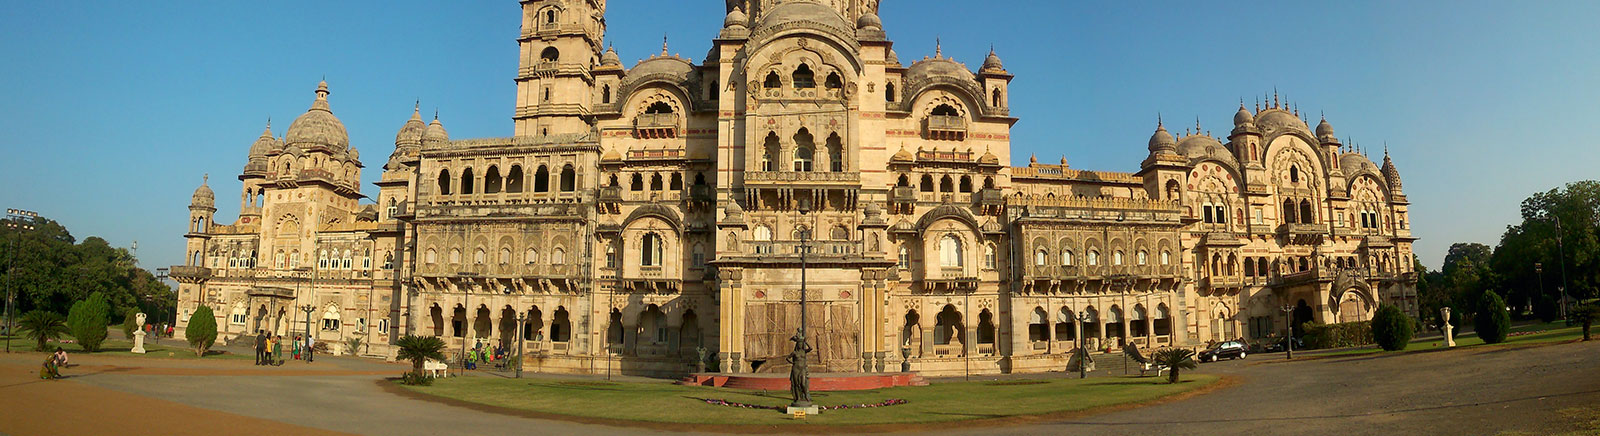 In & Around Baroda, Gujarat